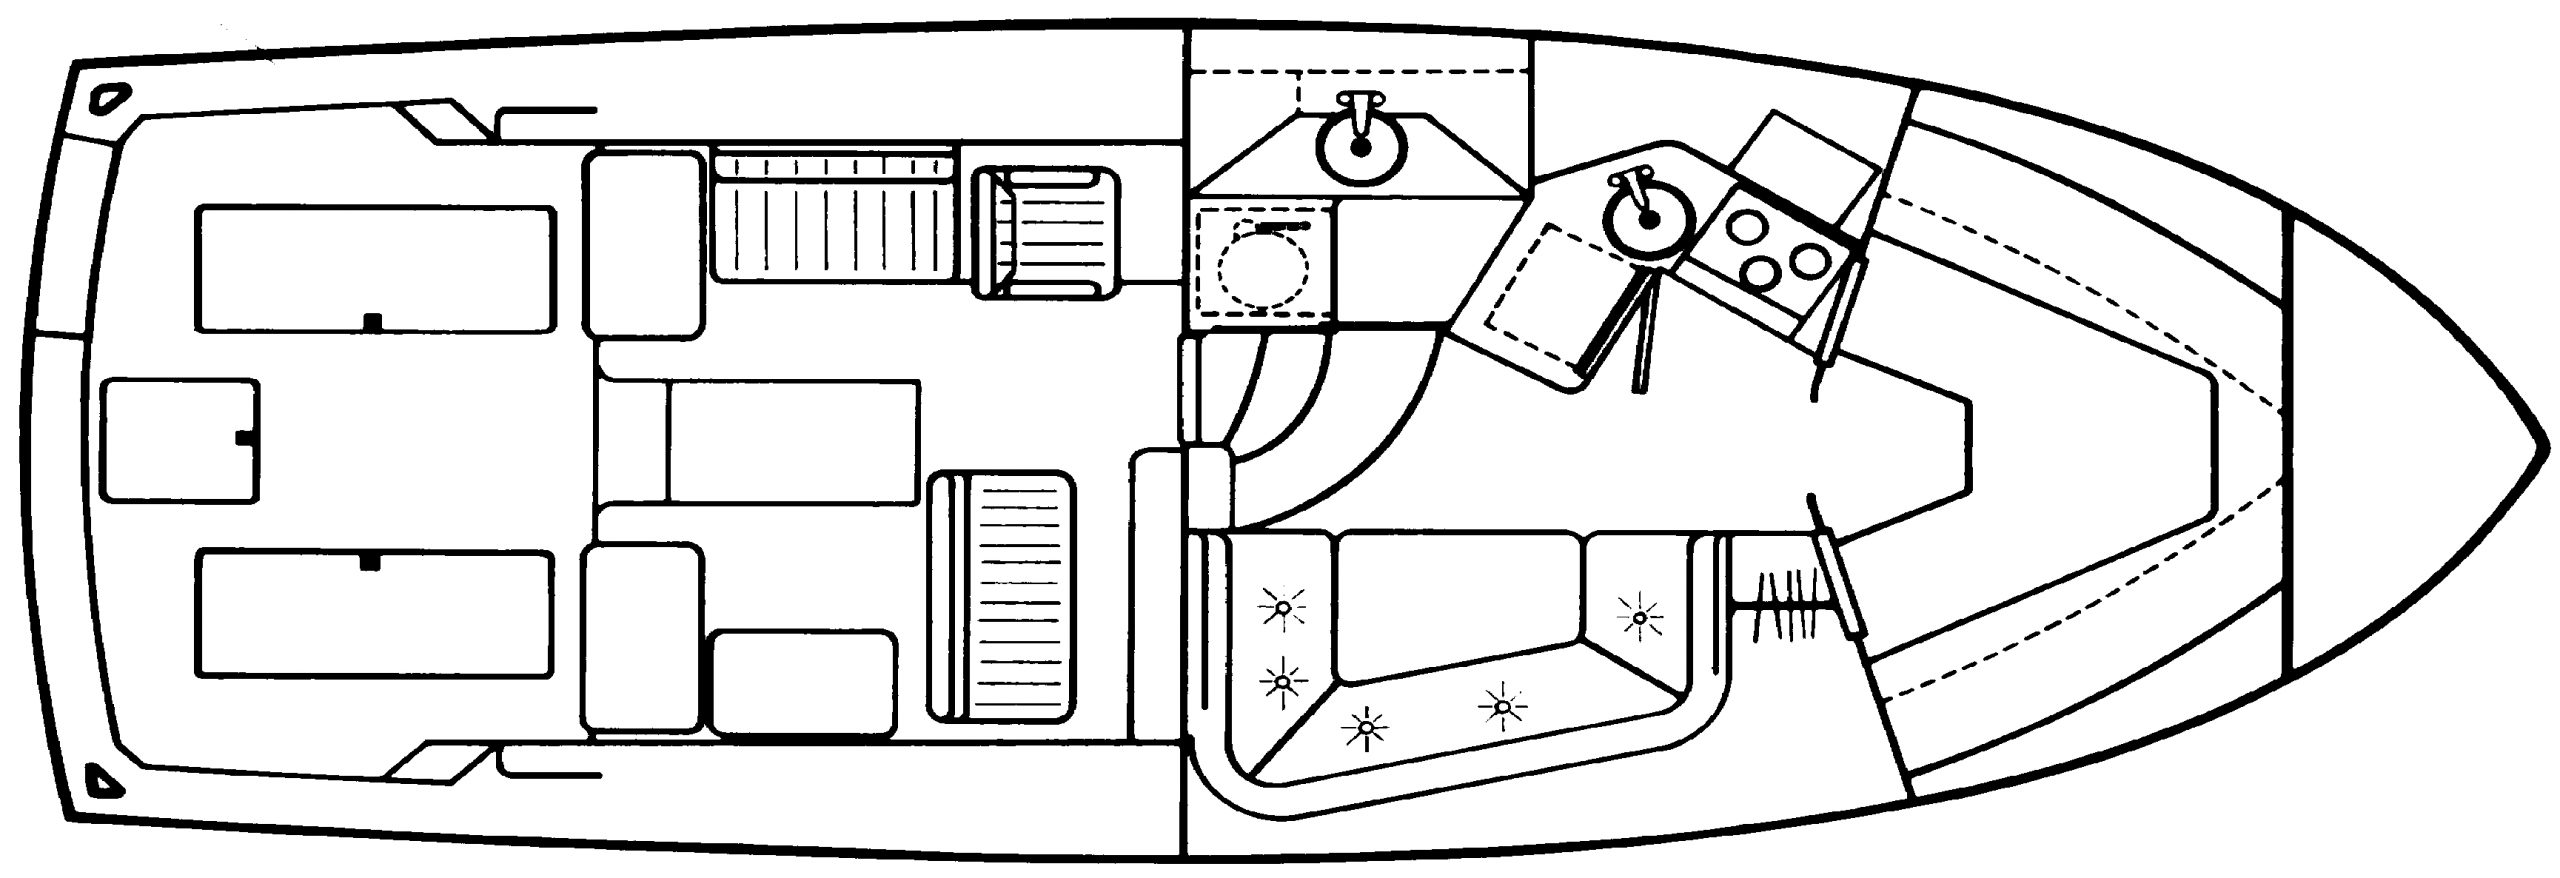 36 Sportfisherman Floor Plan 1